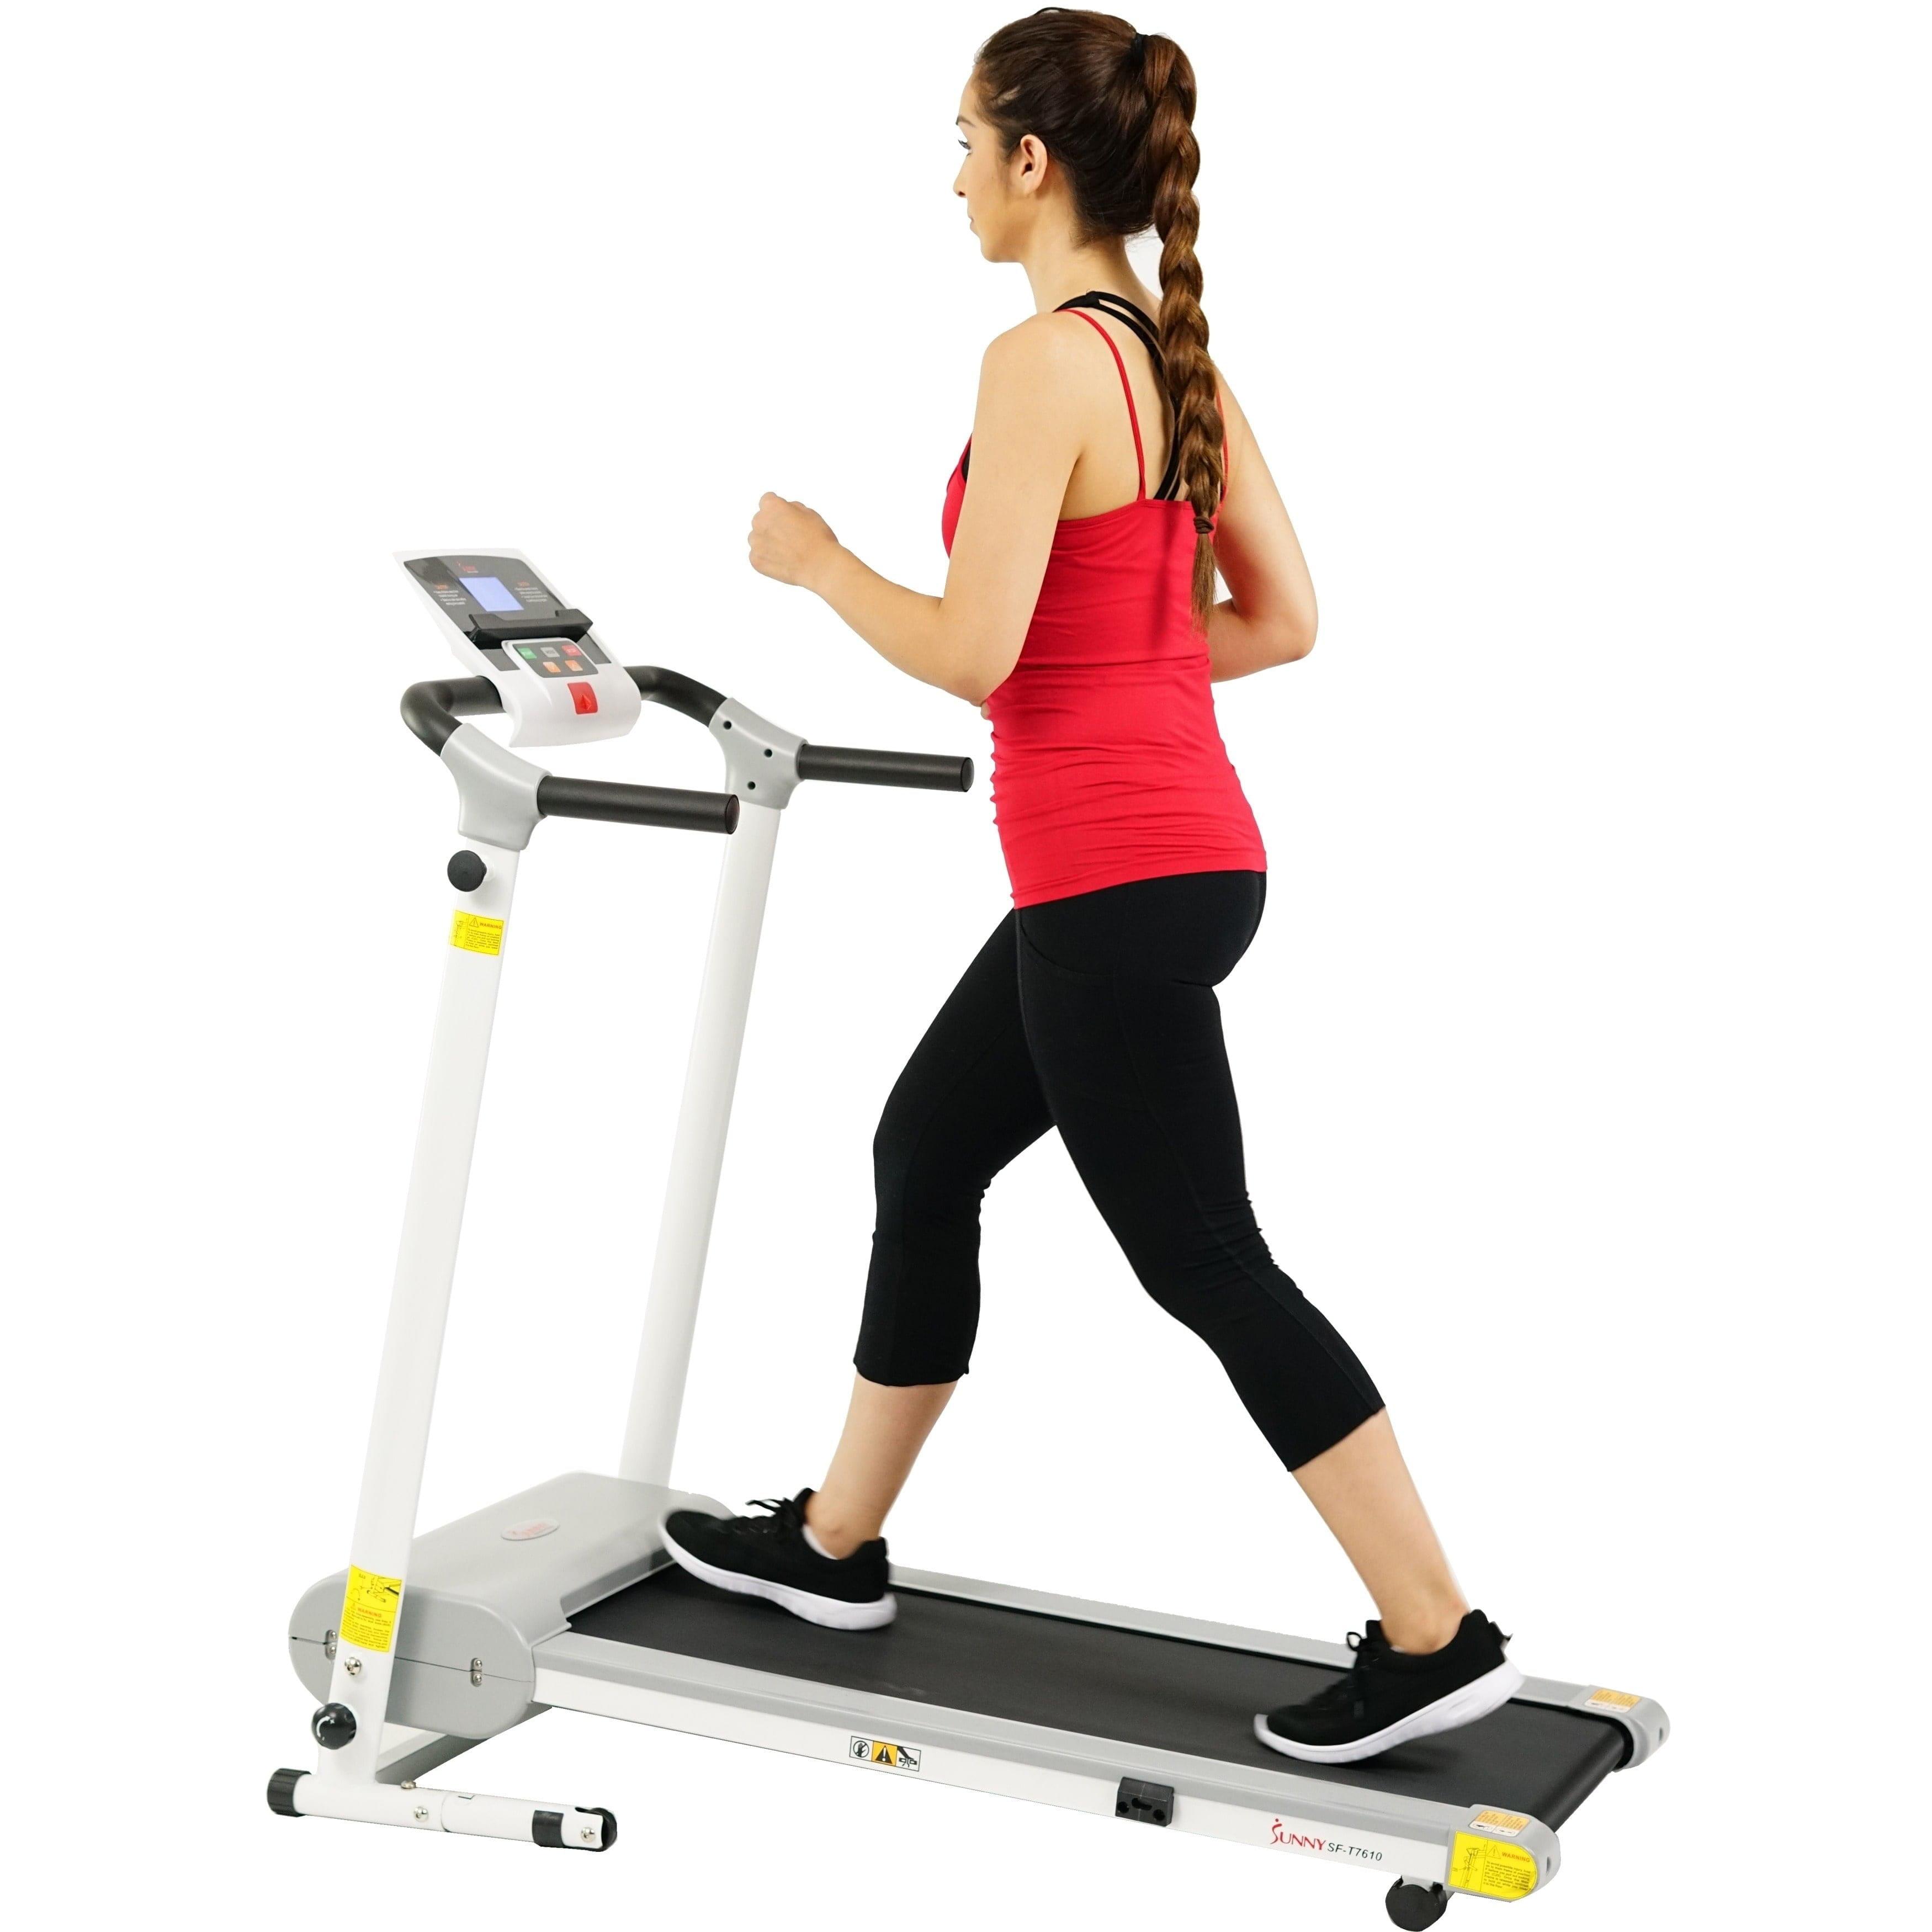 Sunny Health & Fitness Easy Assembly Motorized Folding Treadmill w  LCD Display White by Sunny Health Fitness